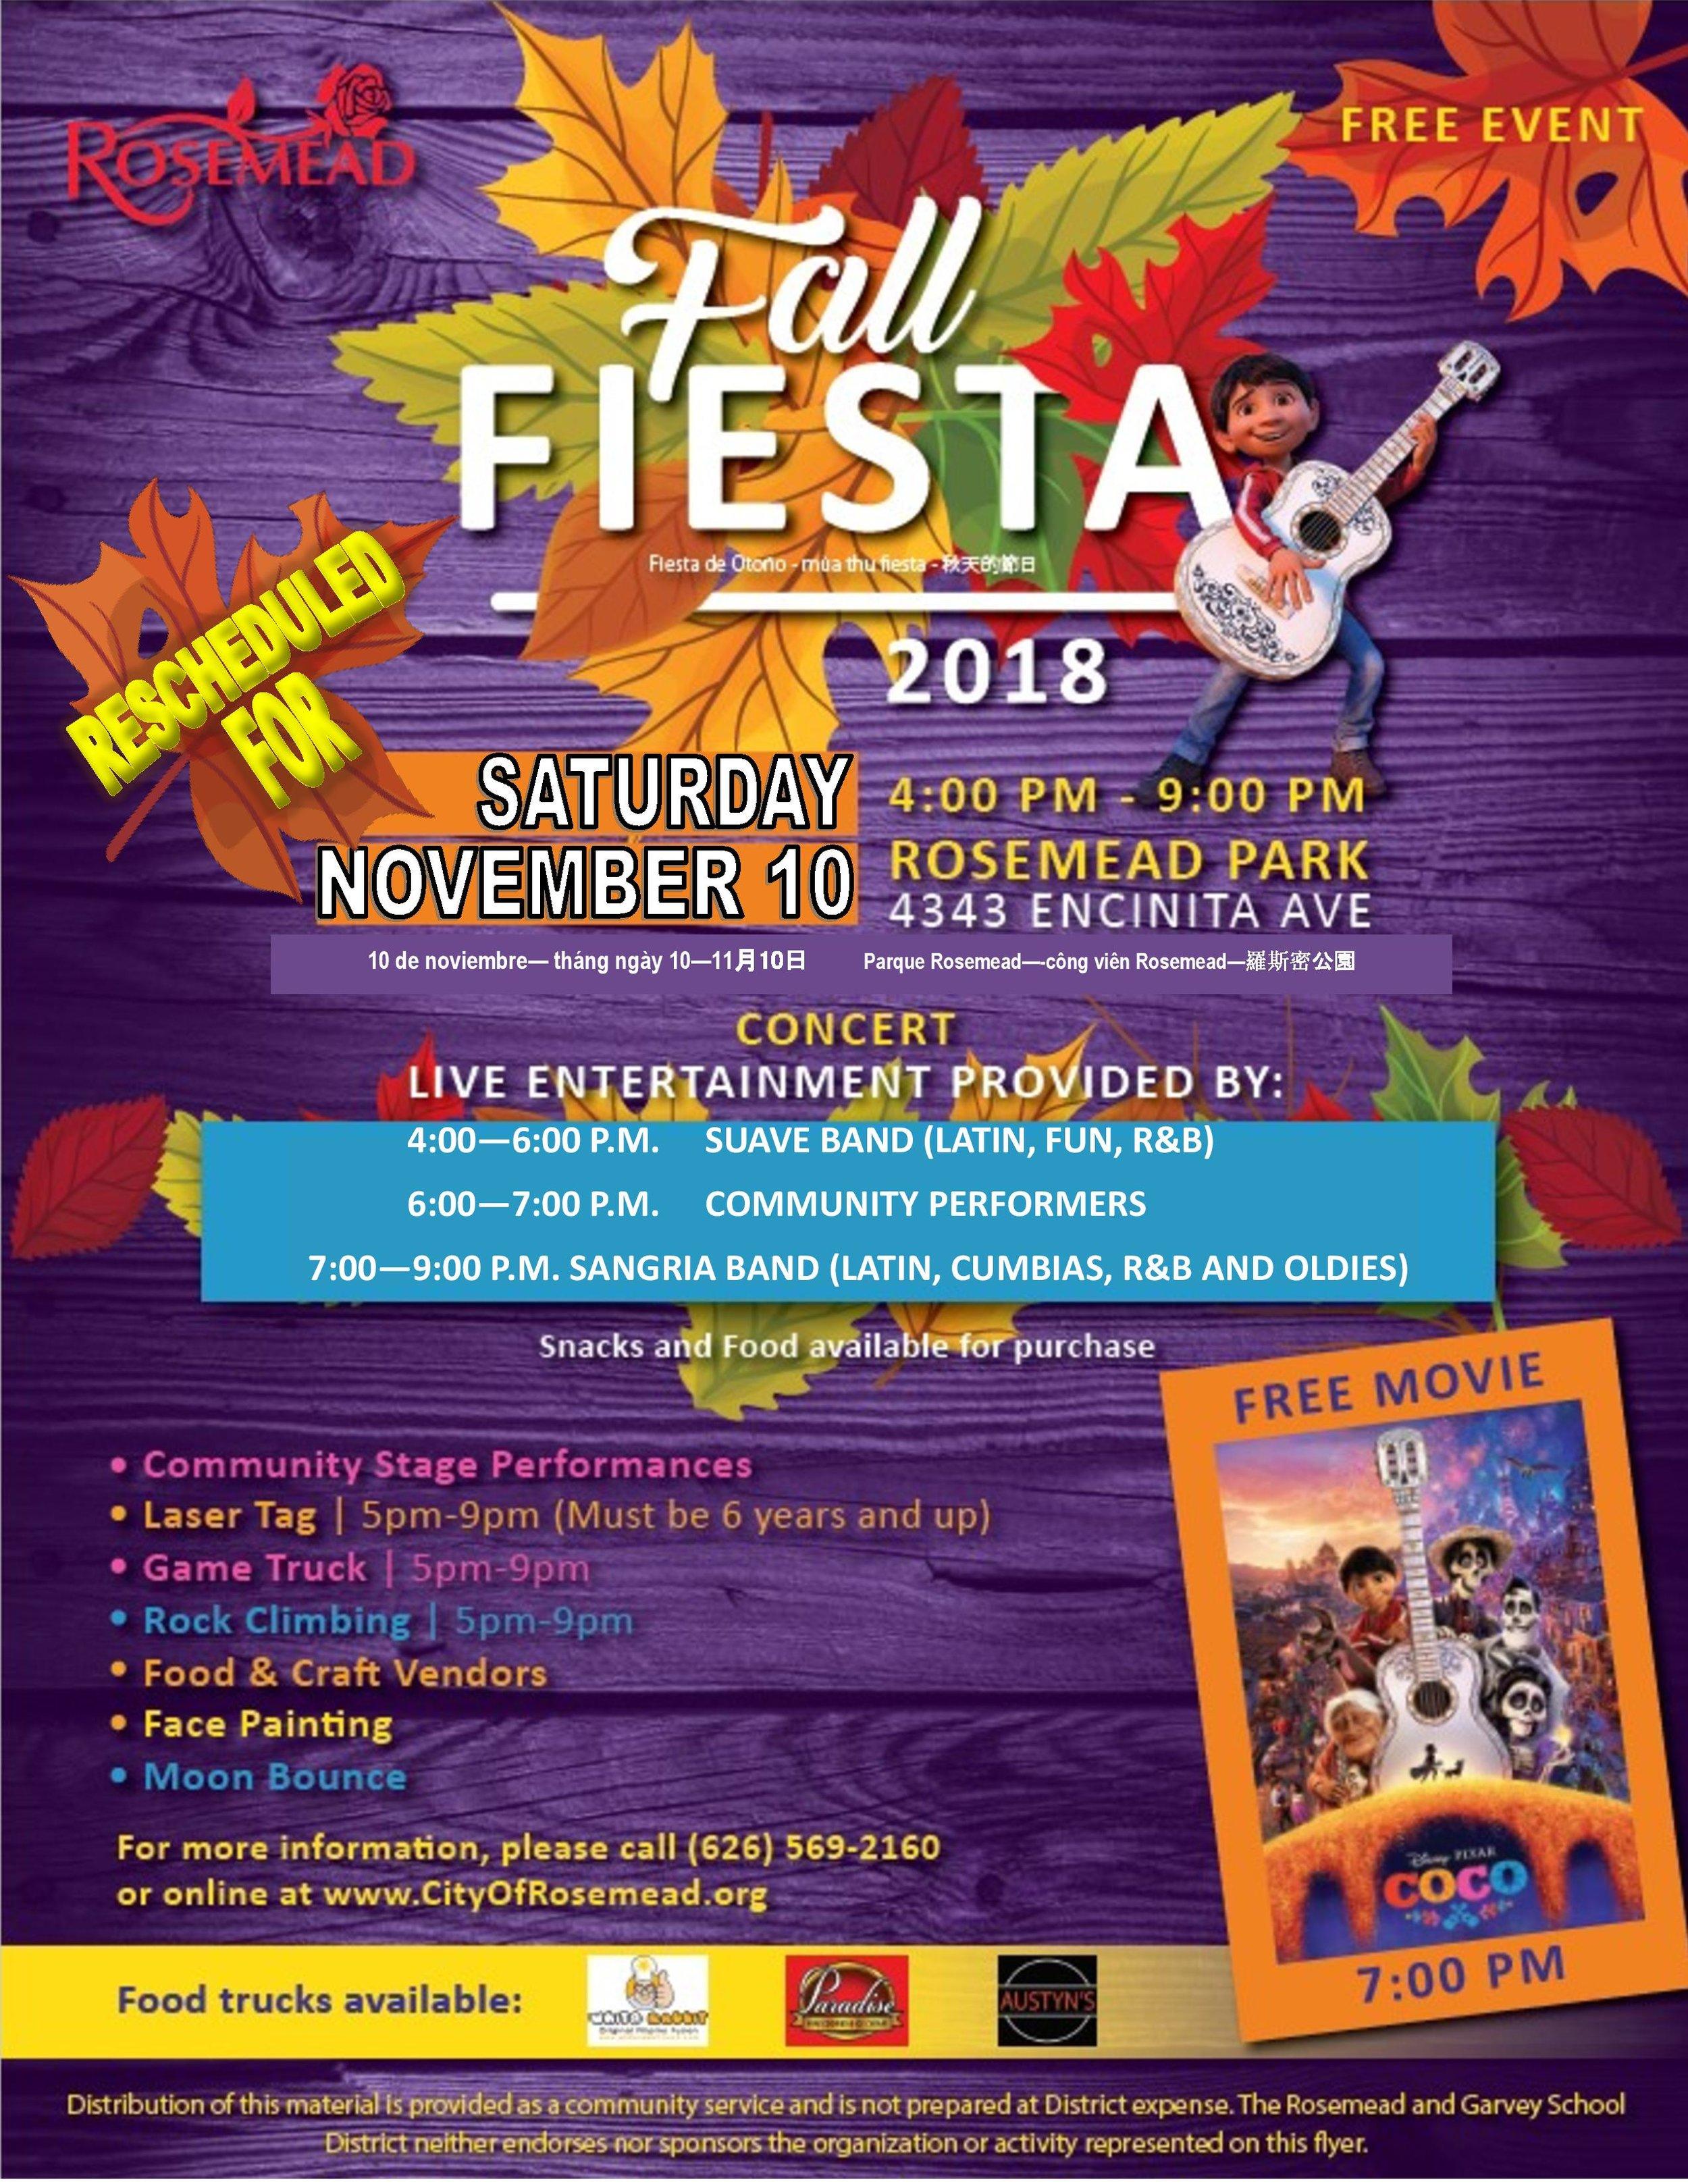 Fall fiesta 2018 - November 10th, 2018